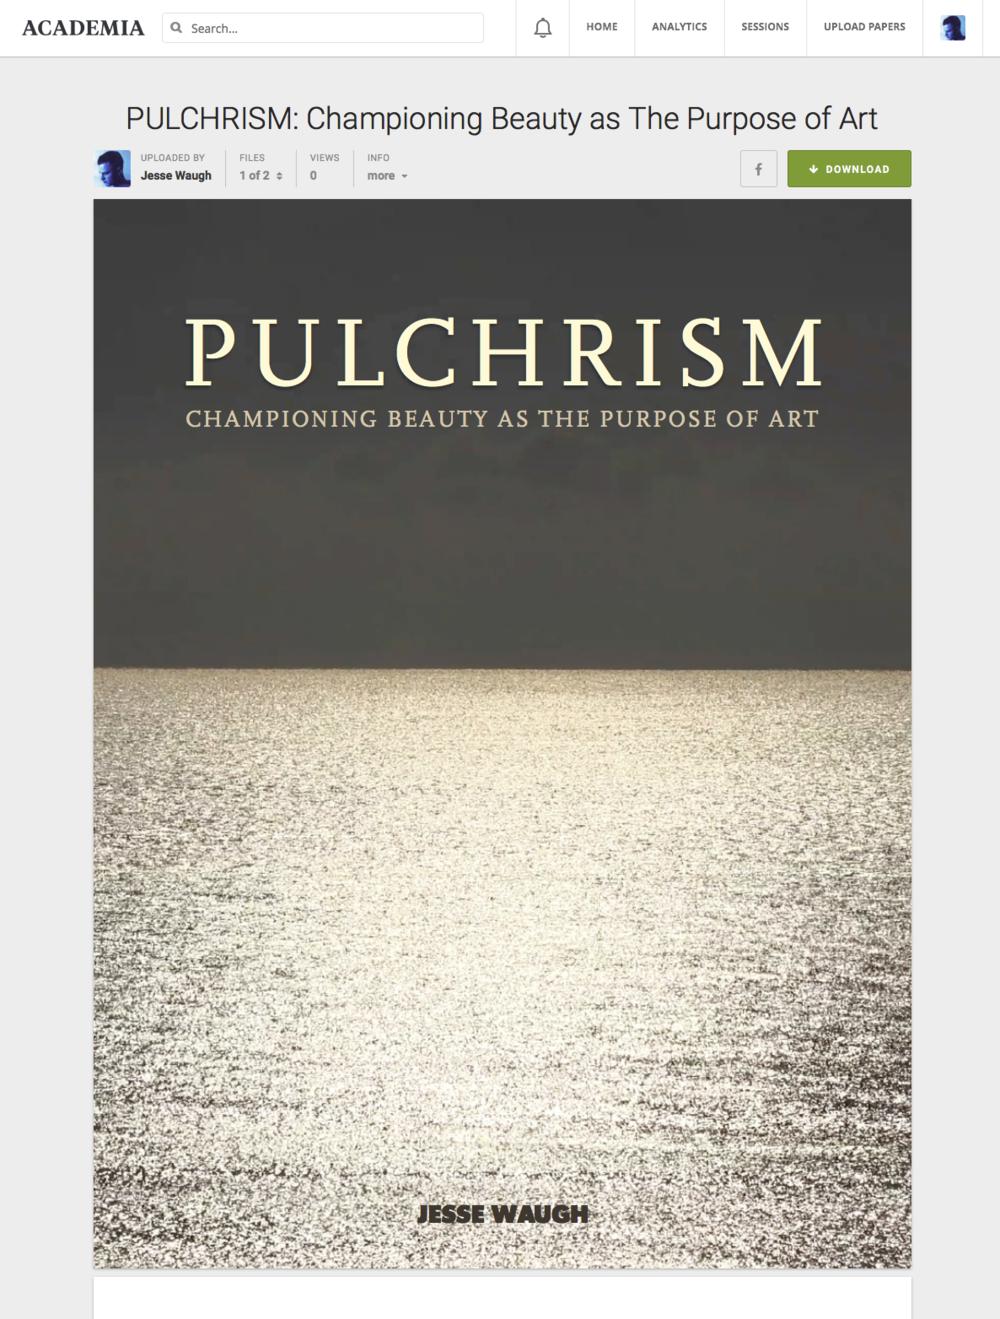 2015-10-31-PULCHRISM-Academia.edu-jessewaugh.com